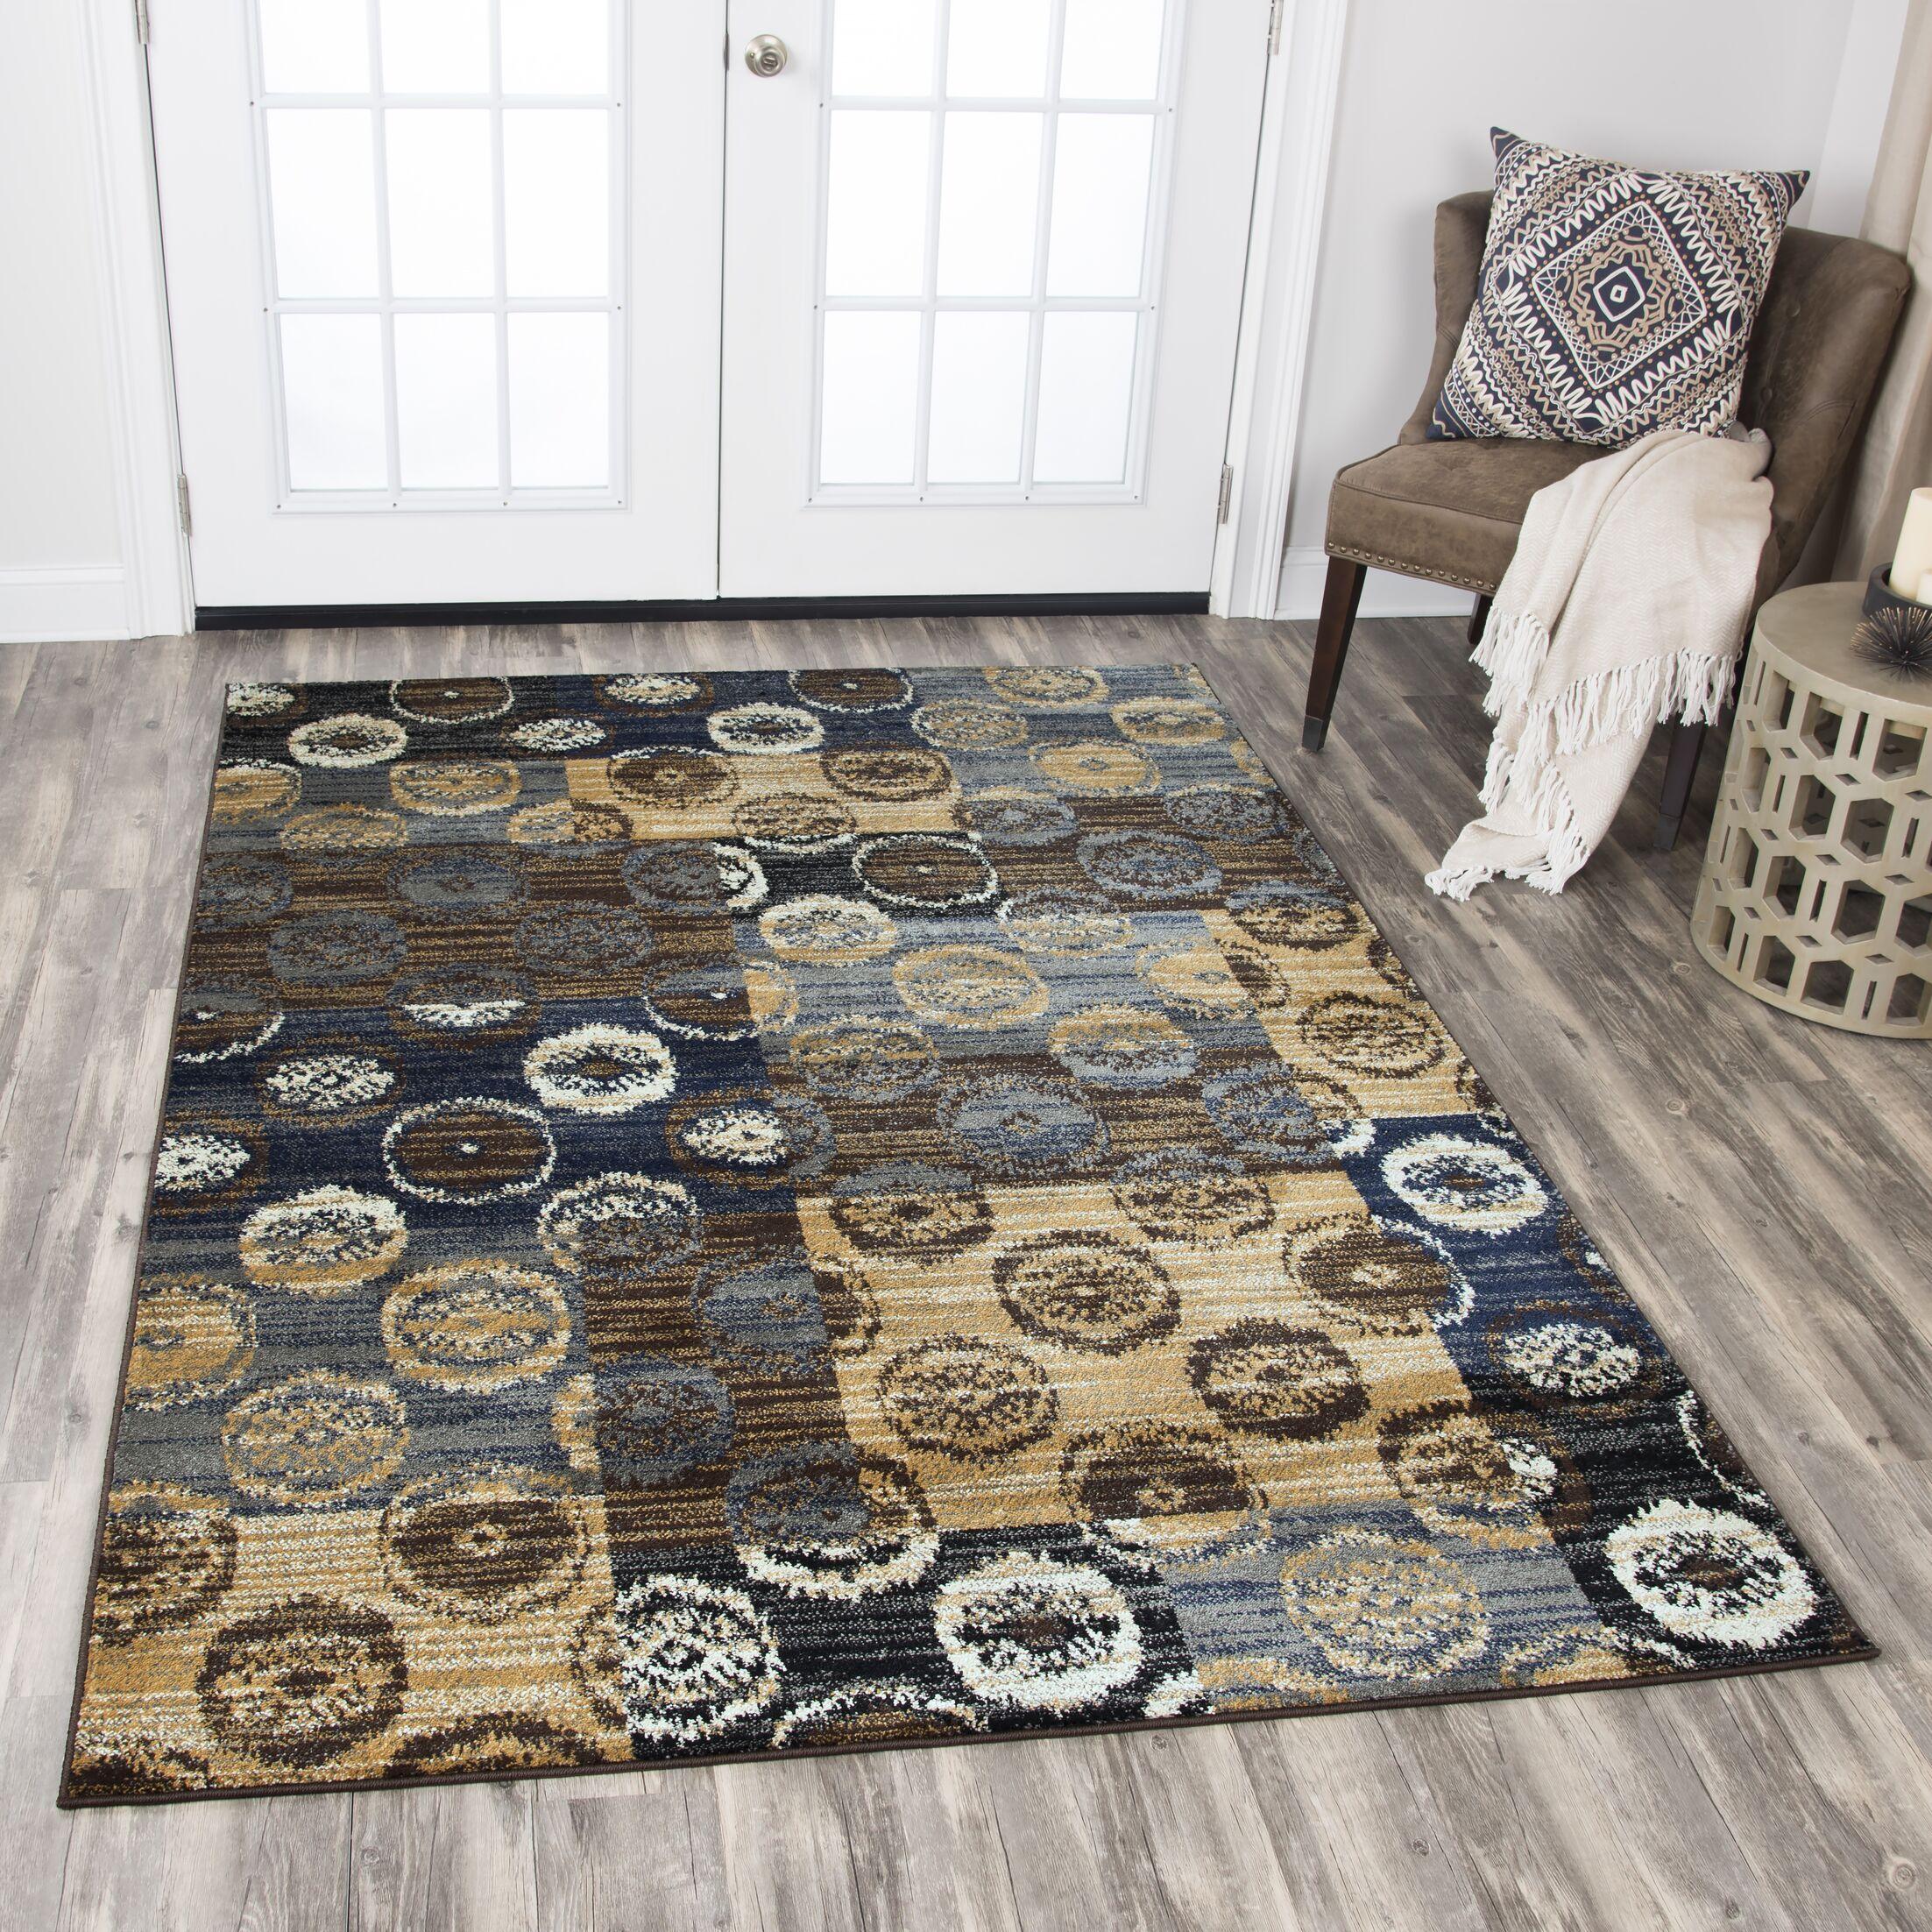 Phillip Beige/Brown Area Rug Rug Size: Rectangle 8' x 10'